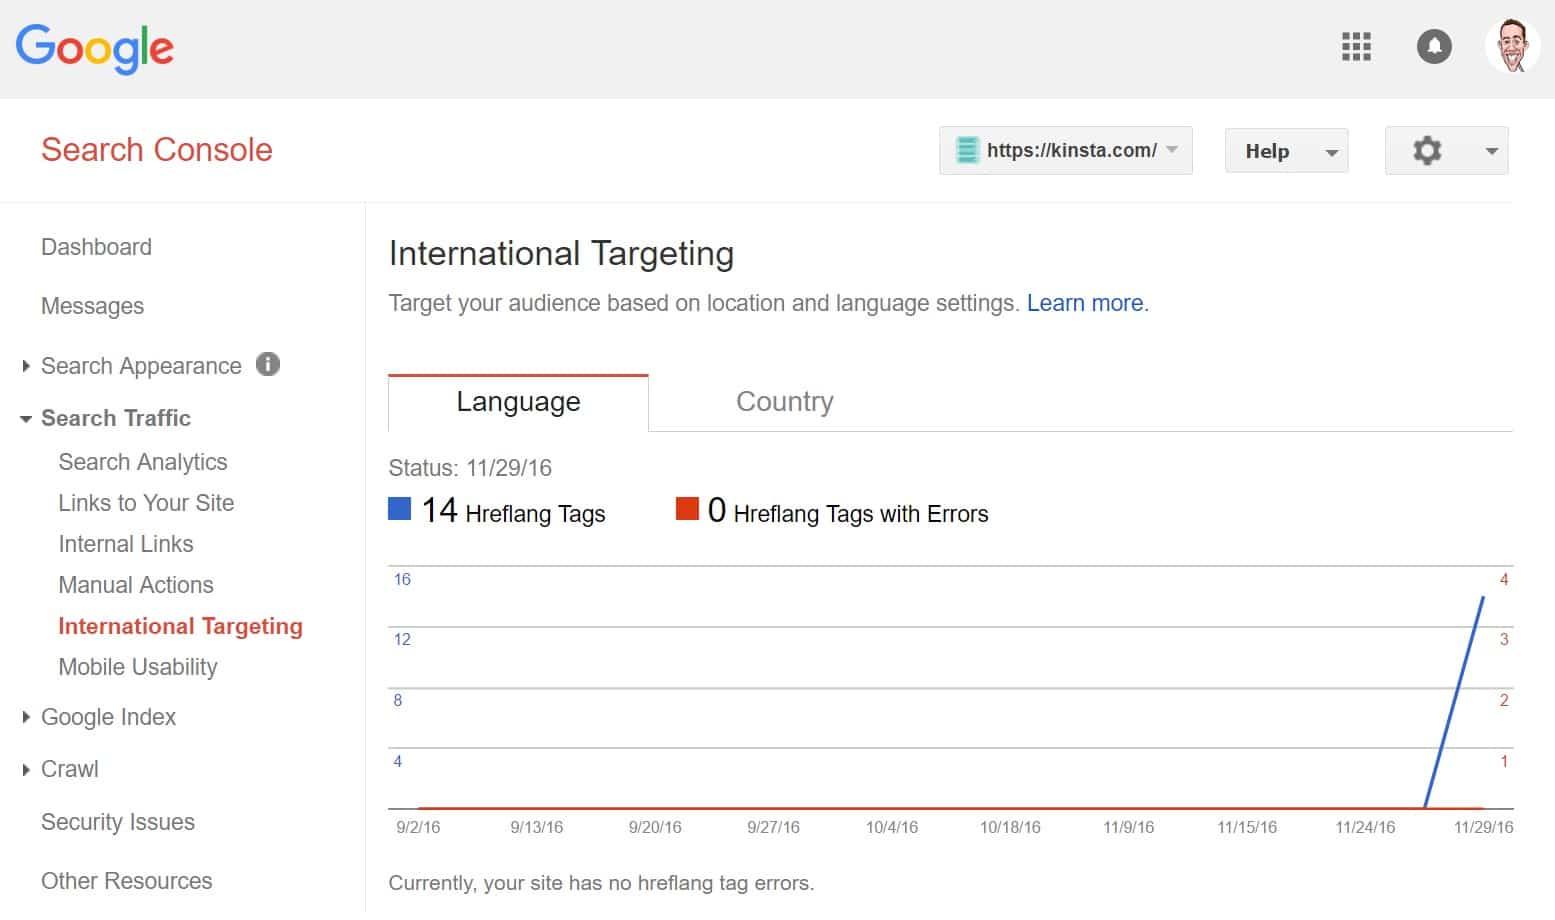 International målretning af Google Search Console